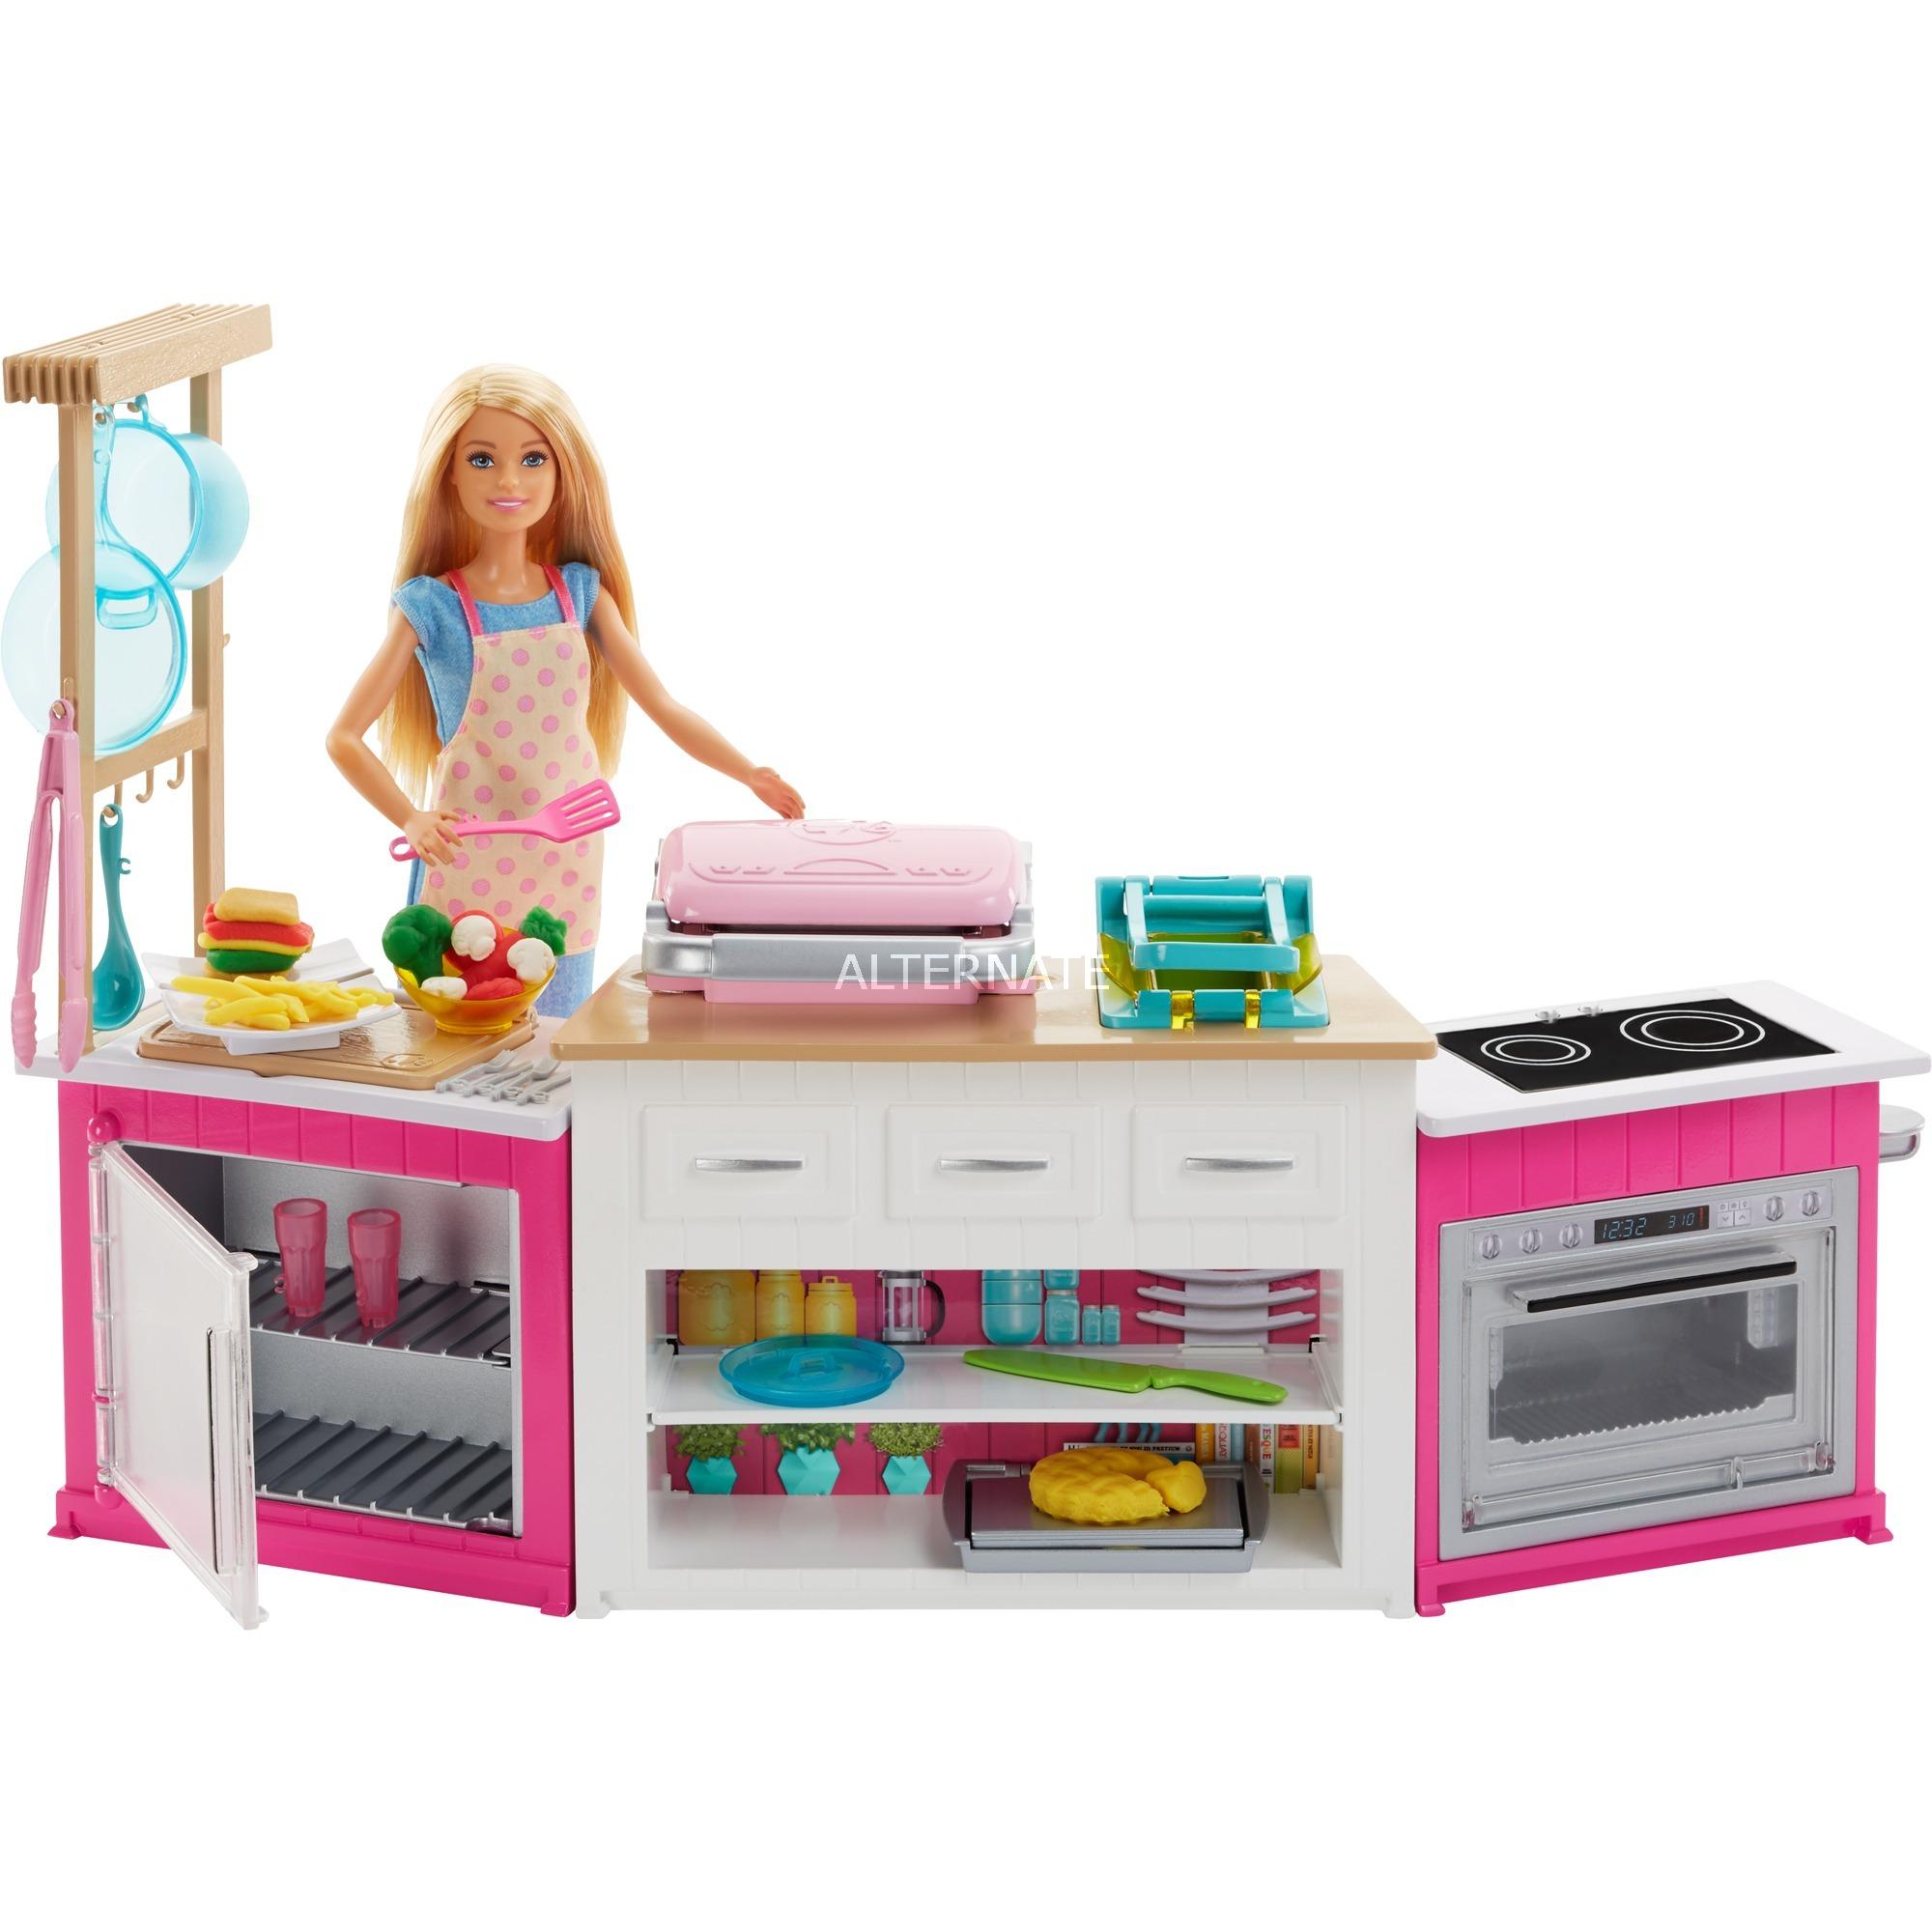 Mattel Frh73 Barbie Kokken Cooking Baking Deluxe Dukke Inkls Dukke